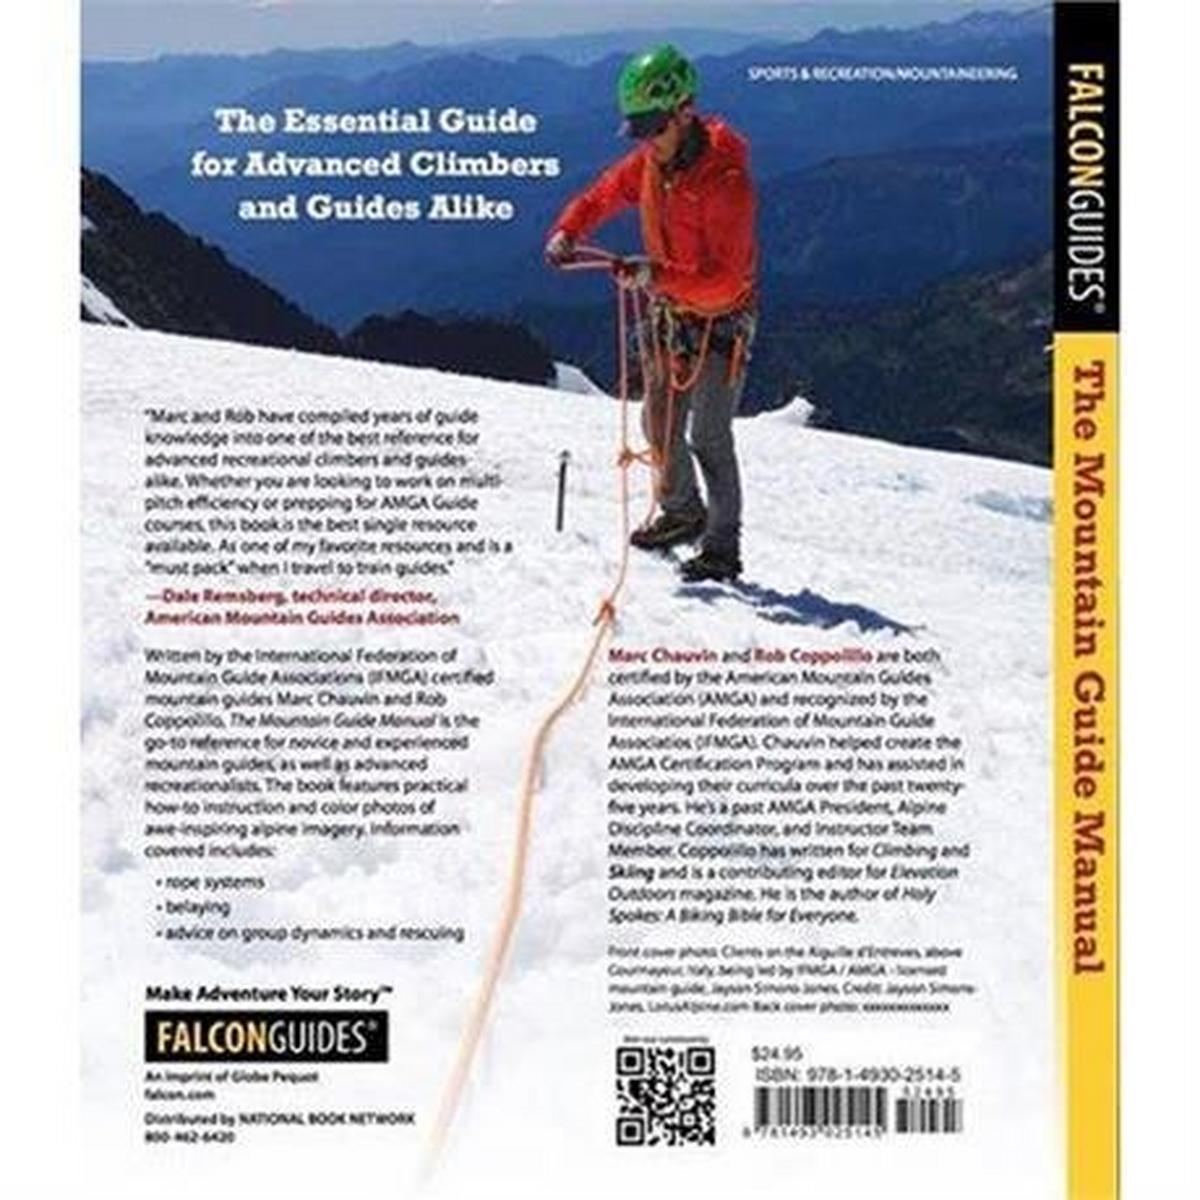 Miscellaneous Book: The Mountain Guide Manual